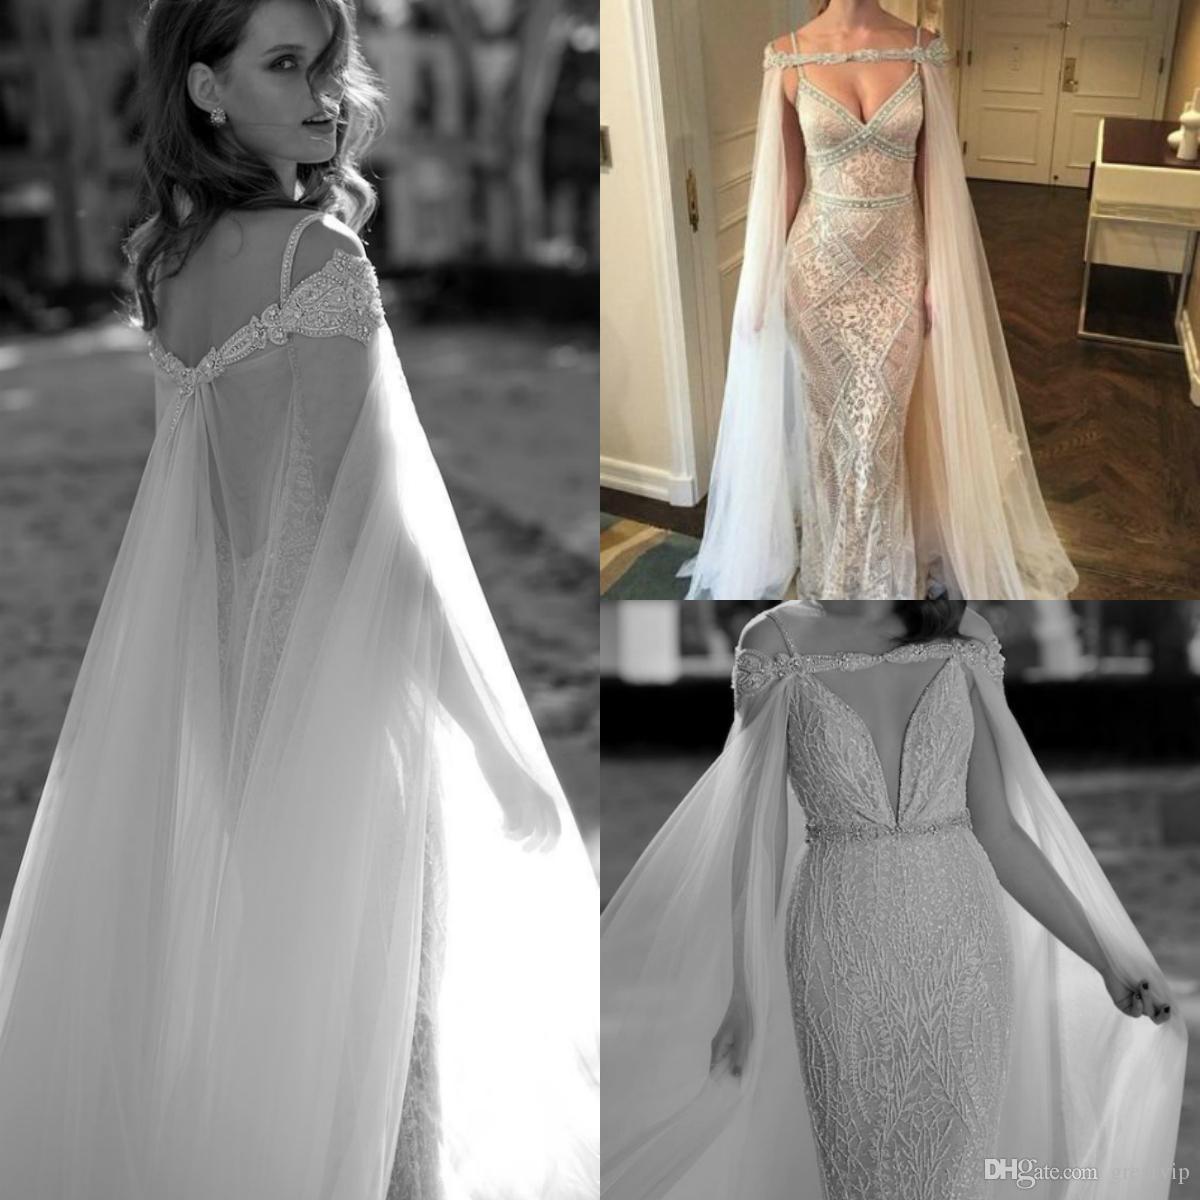 Long Bridal Wraps Jackets Wedding Capes Cloaks Women Shawls Rhinestones Crystals Sheer Tulle Bridal Boleros Free Shipping